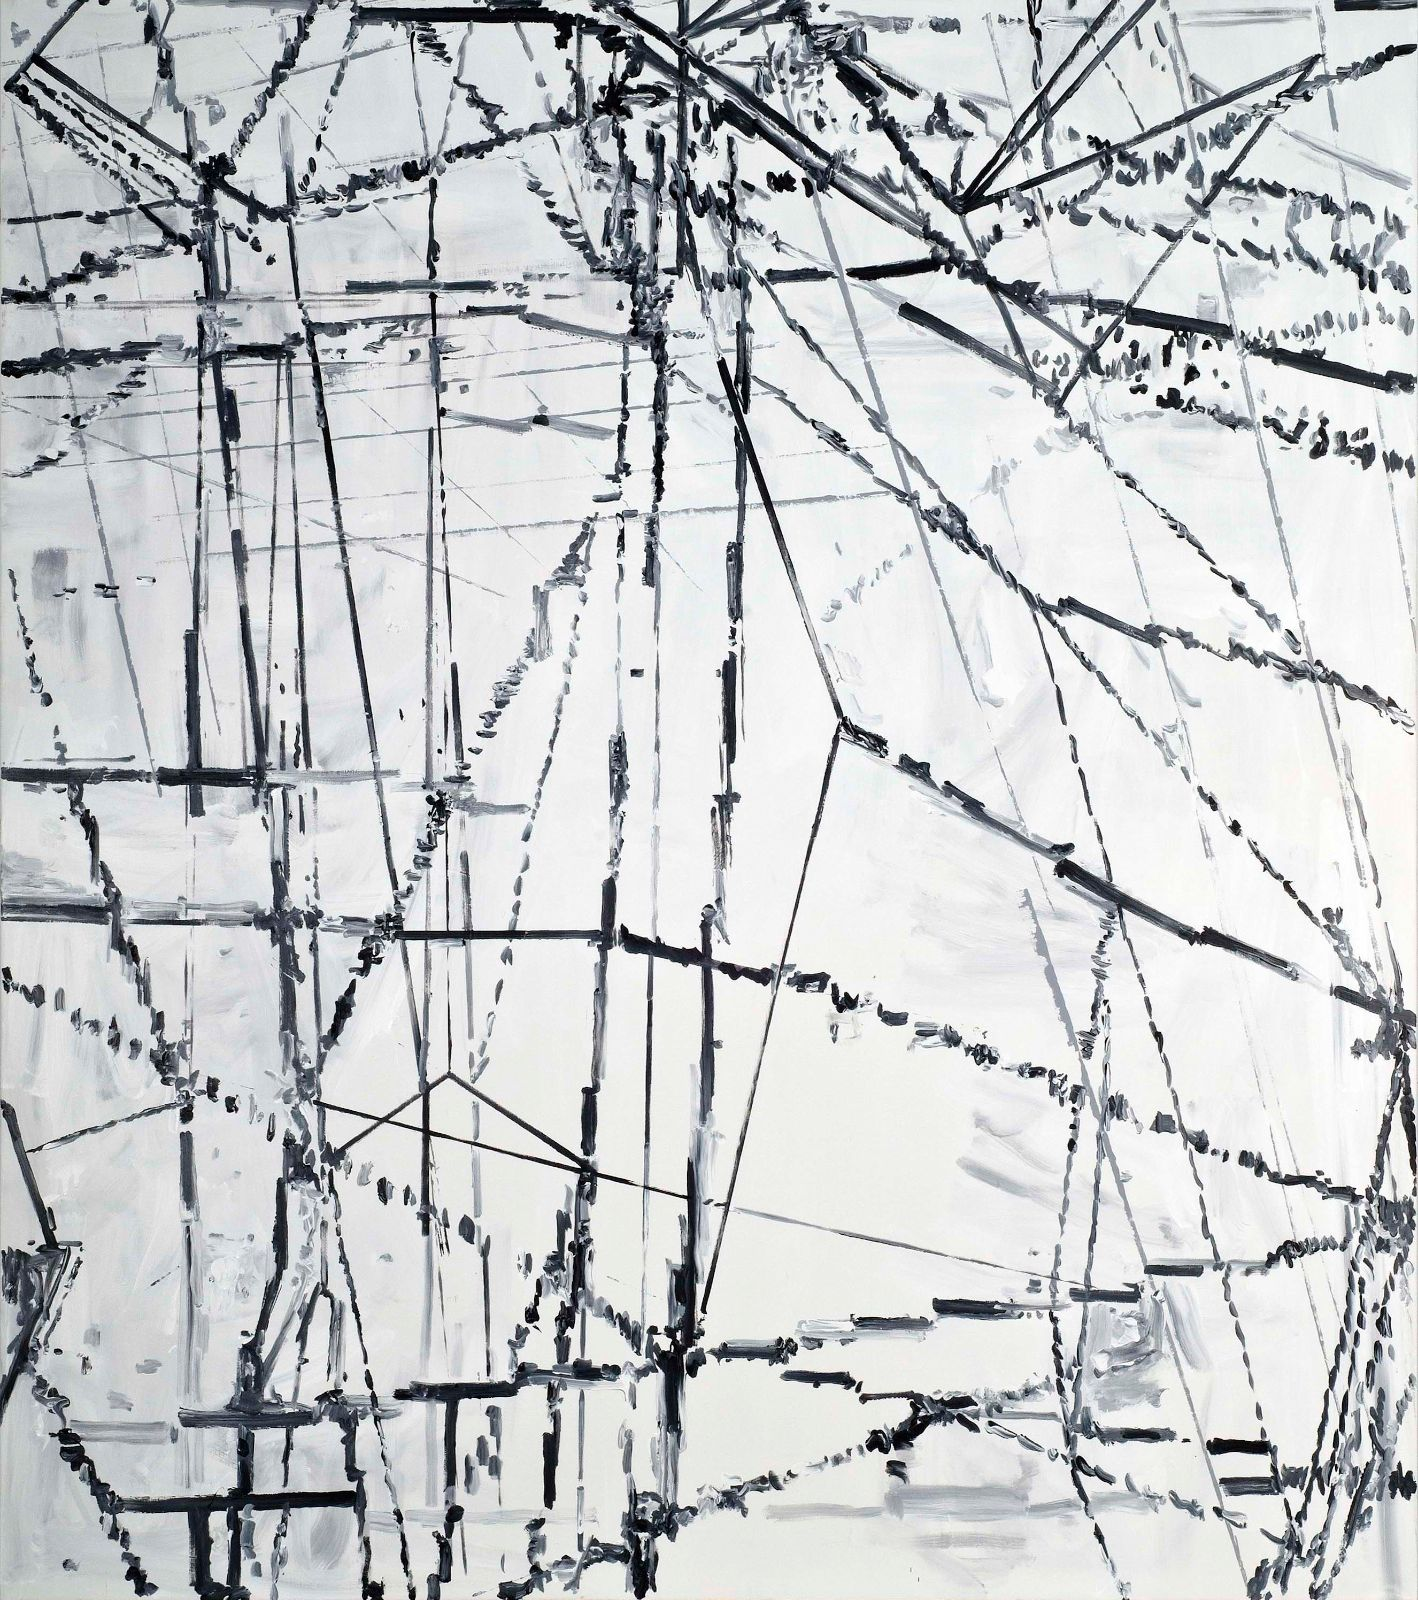 Untitled, 2008, acrylic on canvas, 250 x 220 cm